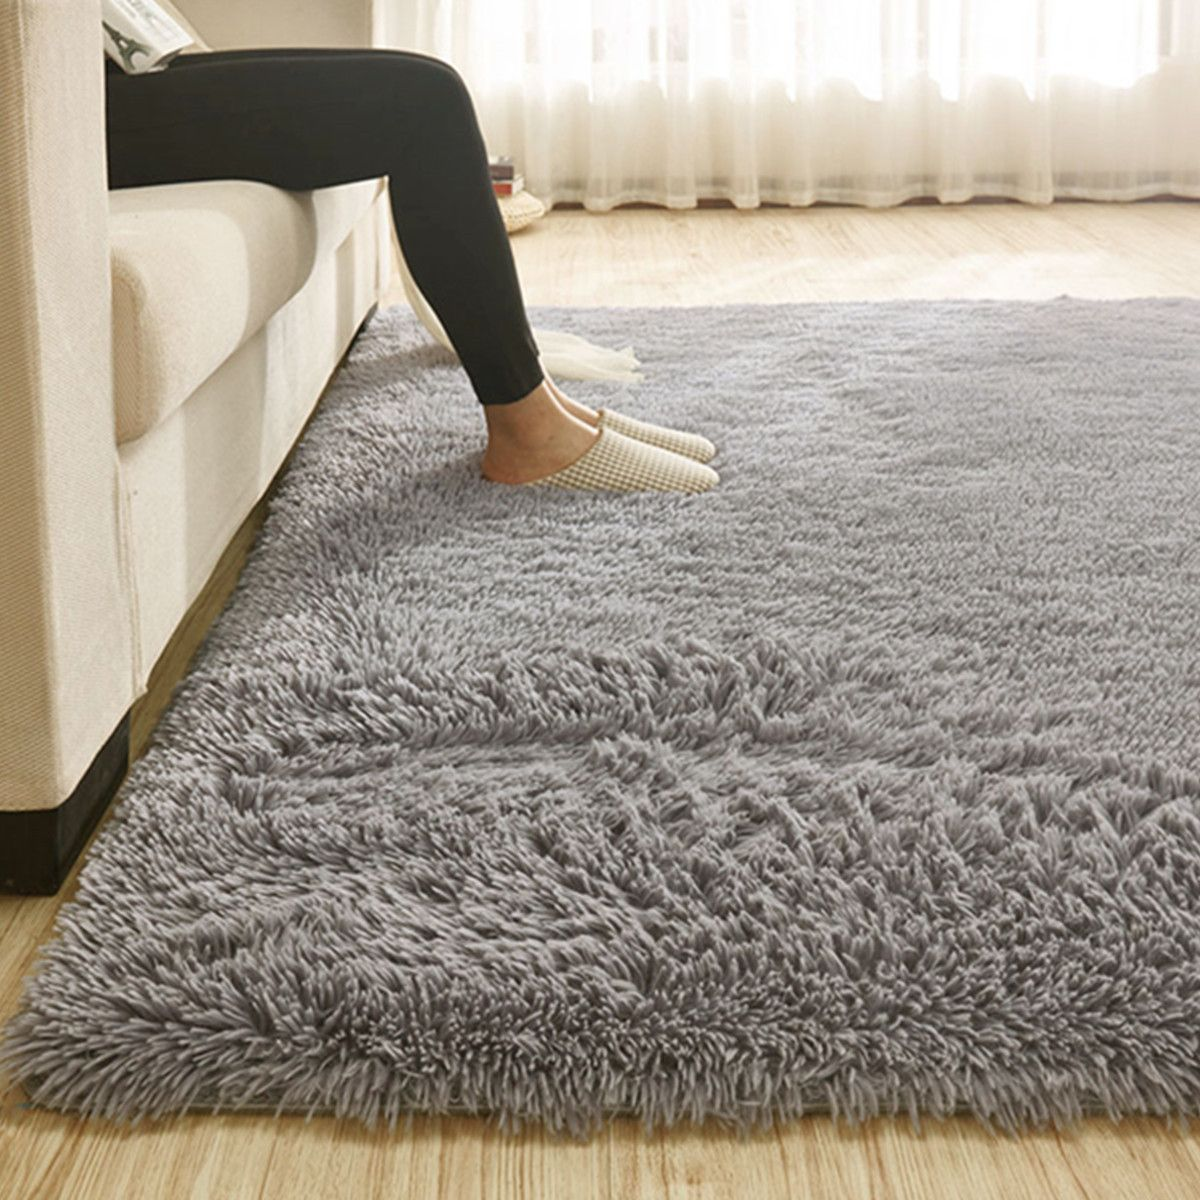 Free 2 Day Shipping Buy Modern Comfortable Soft Floor Rug Plush Fluffy Shag Area Rug Bedroom Living Room Carpet At In 2020 Bedroom Area Rug Soft Carpet Bedroom Carpet